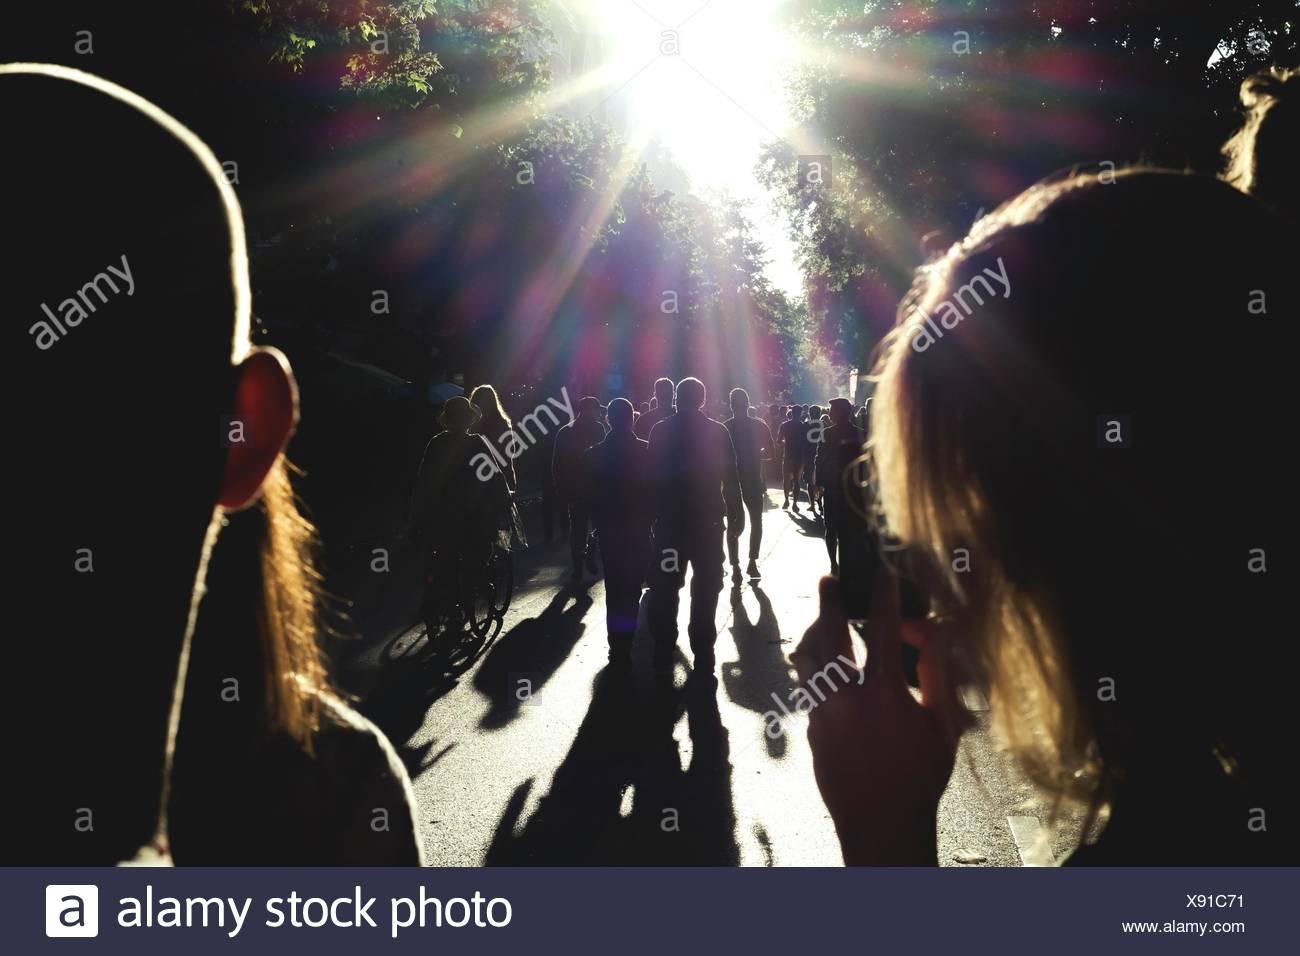 Silhouette People Walking On Road - Stock Image